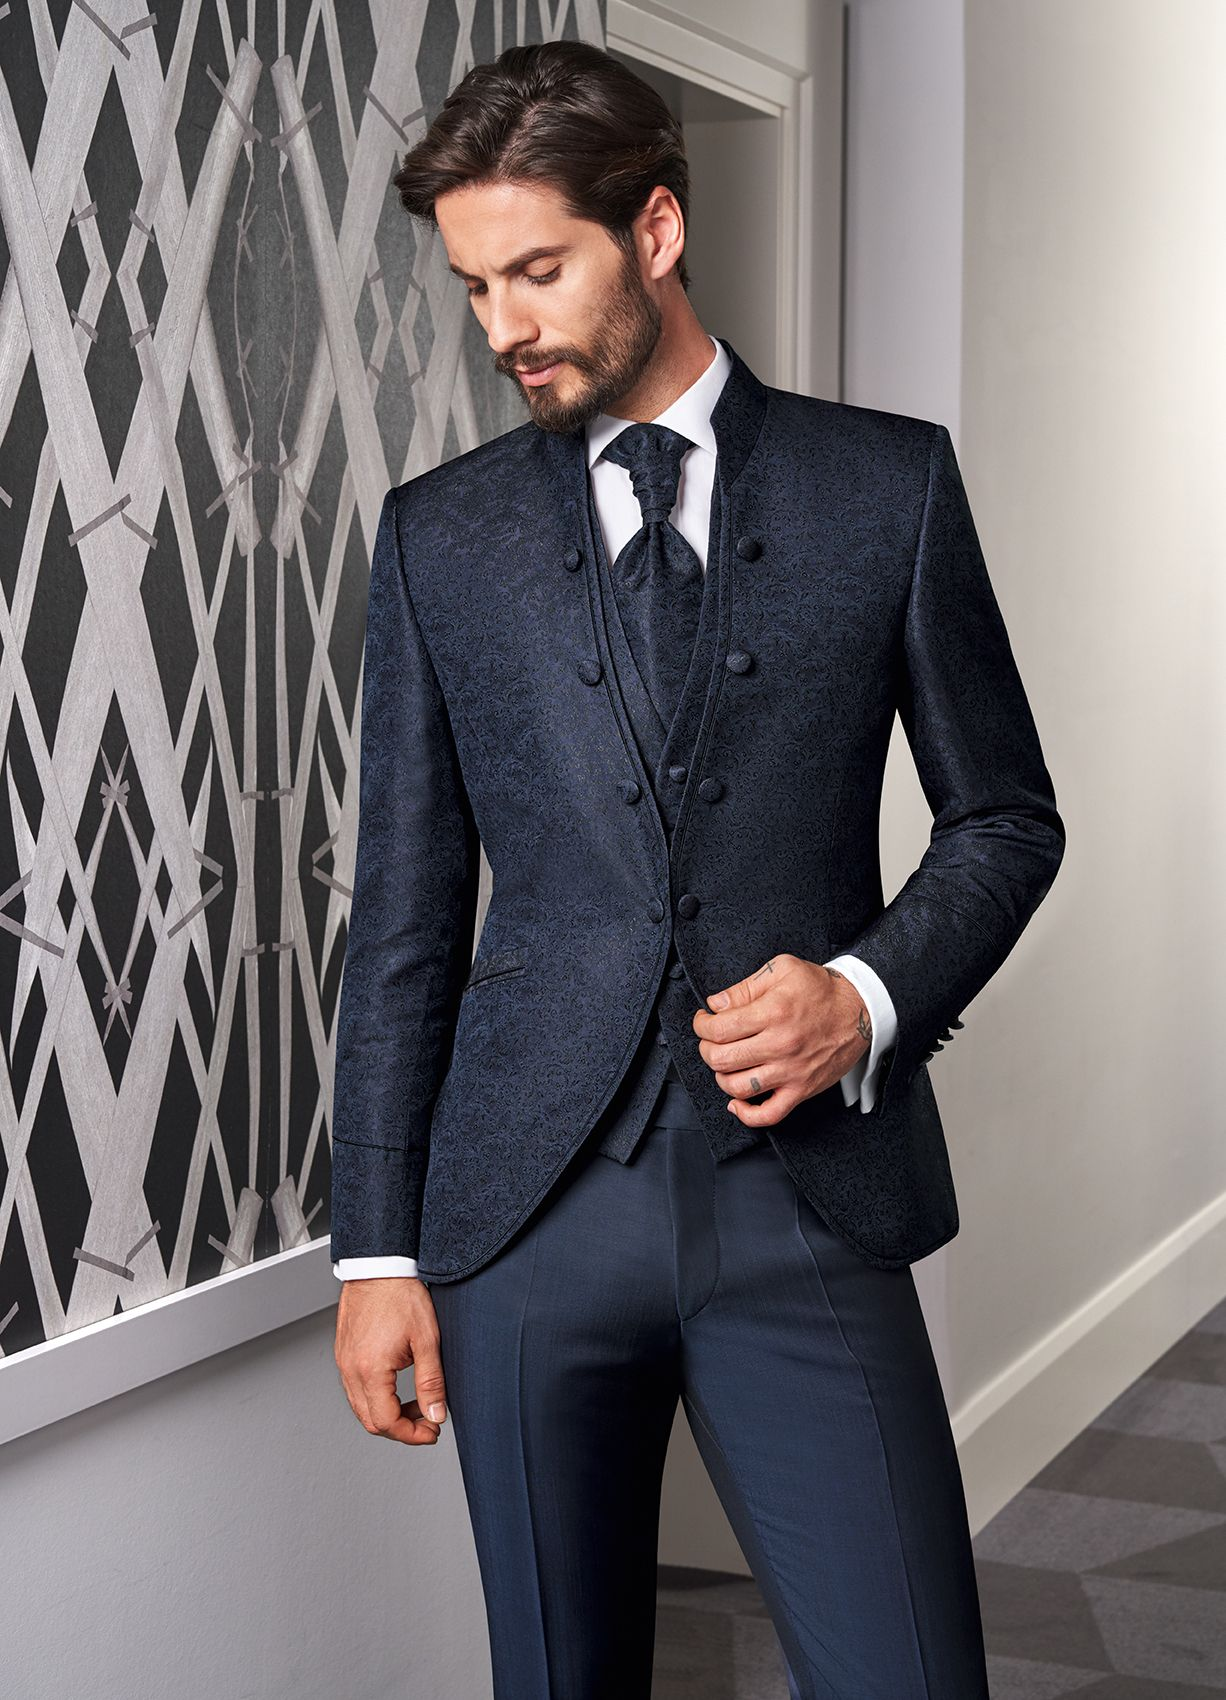 Hochzeitsanzug PRESTIGE 2020 Look 10 | Hochzeitsanzug, Anzug